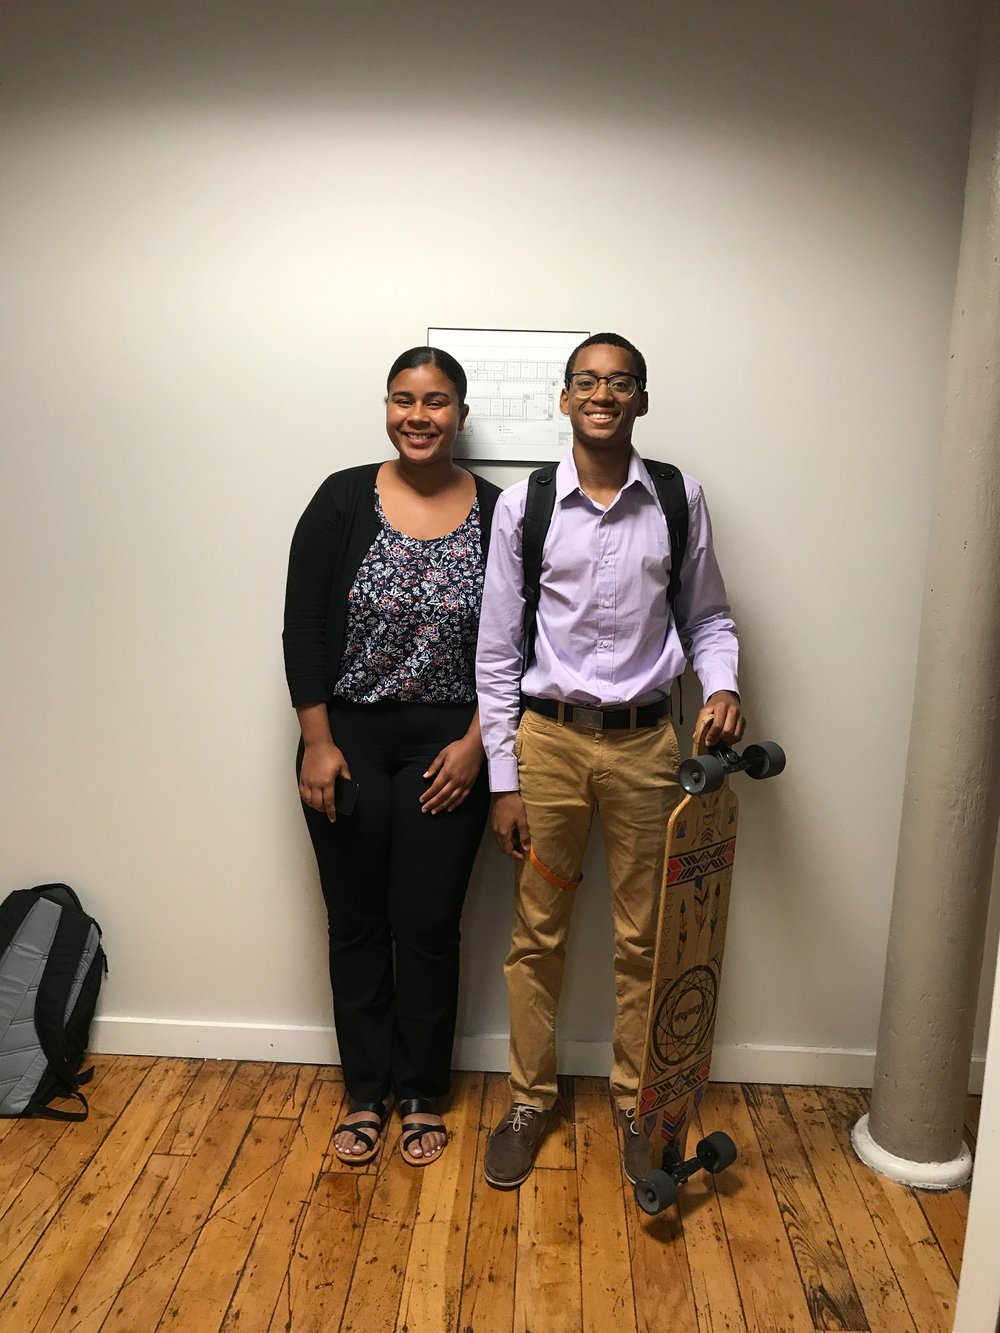 2017 Rubix STEM Cohorts: Seniors Emily Toala (L) and Eddy Castro (R)